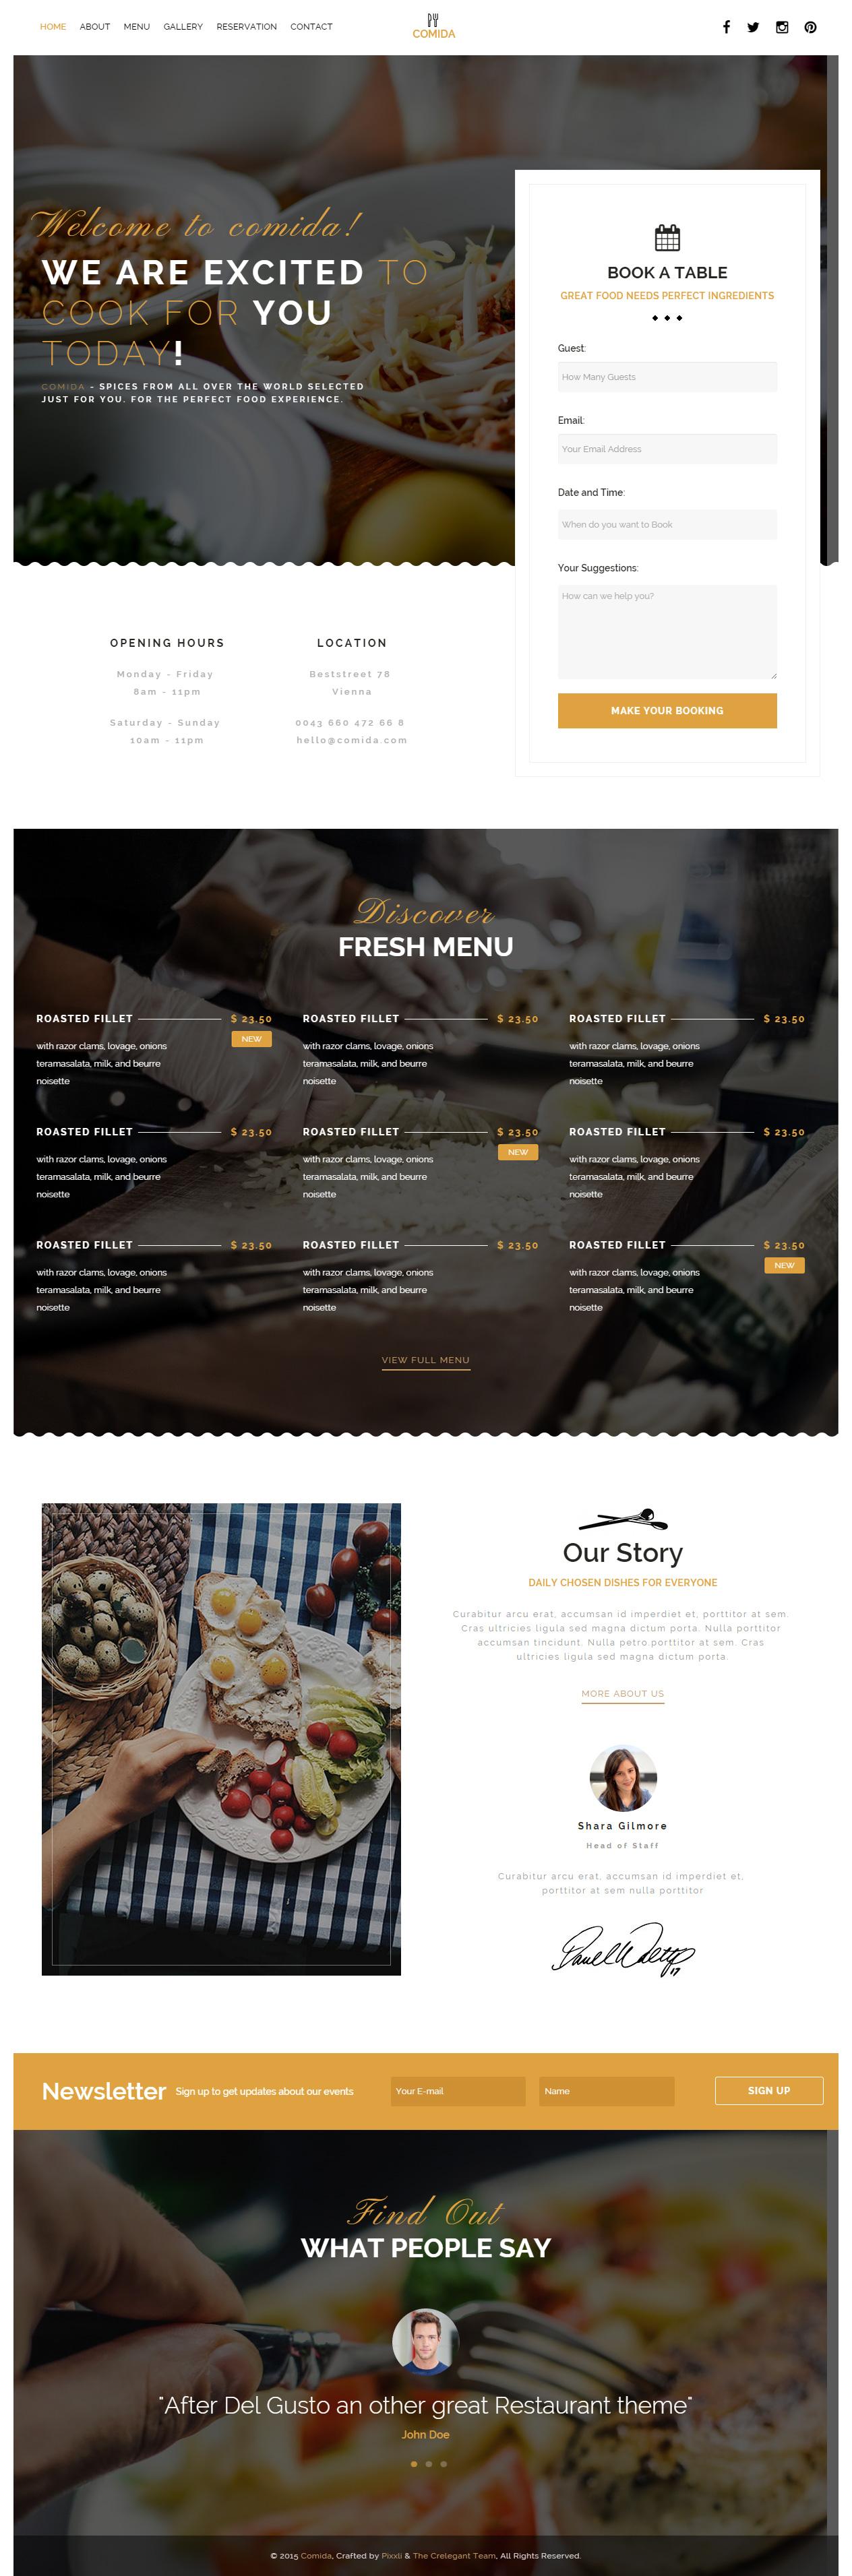 Comida is Premium full Responsive Retina #Restaurant #HTML5 template. #ParallaxScrolling. Bootstrap 3 Framework. Google Map. Test free demo at: http://www.responsivemiracle.com/cms/comida-premium-responsive-restaurant-html5-template/